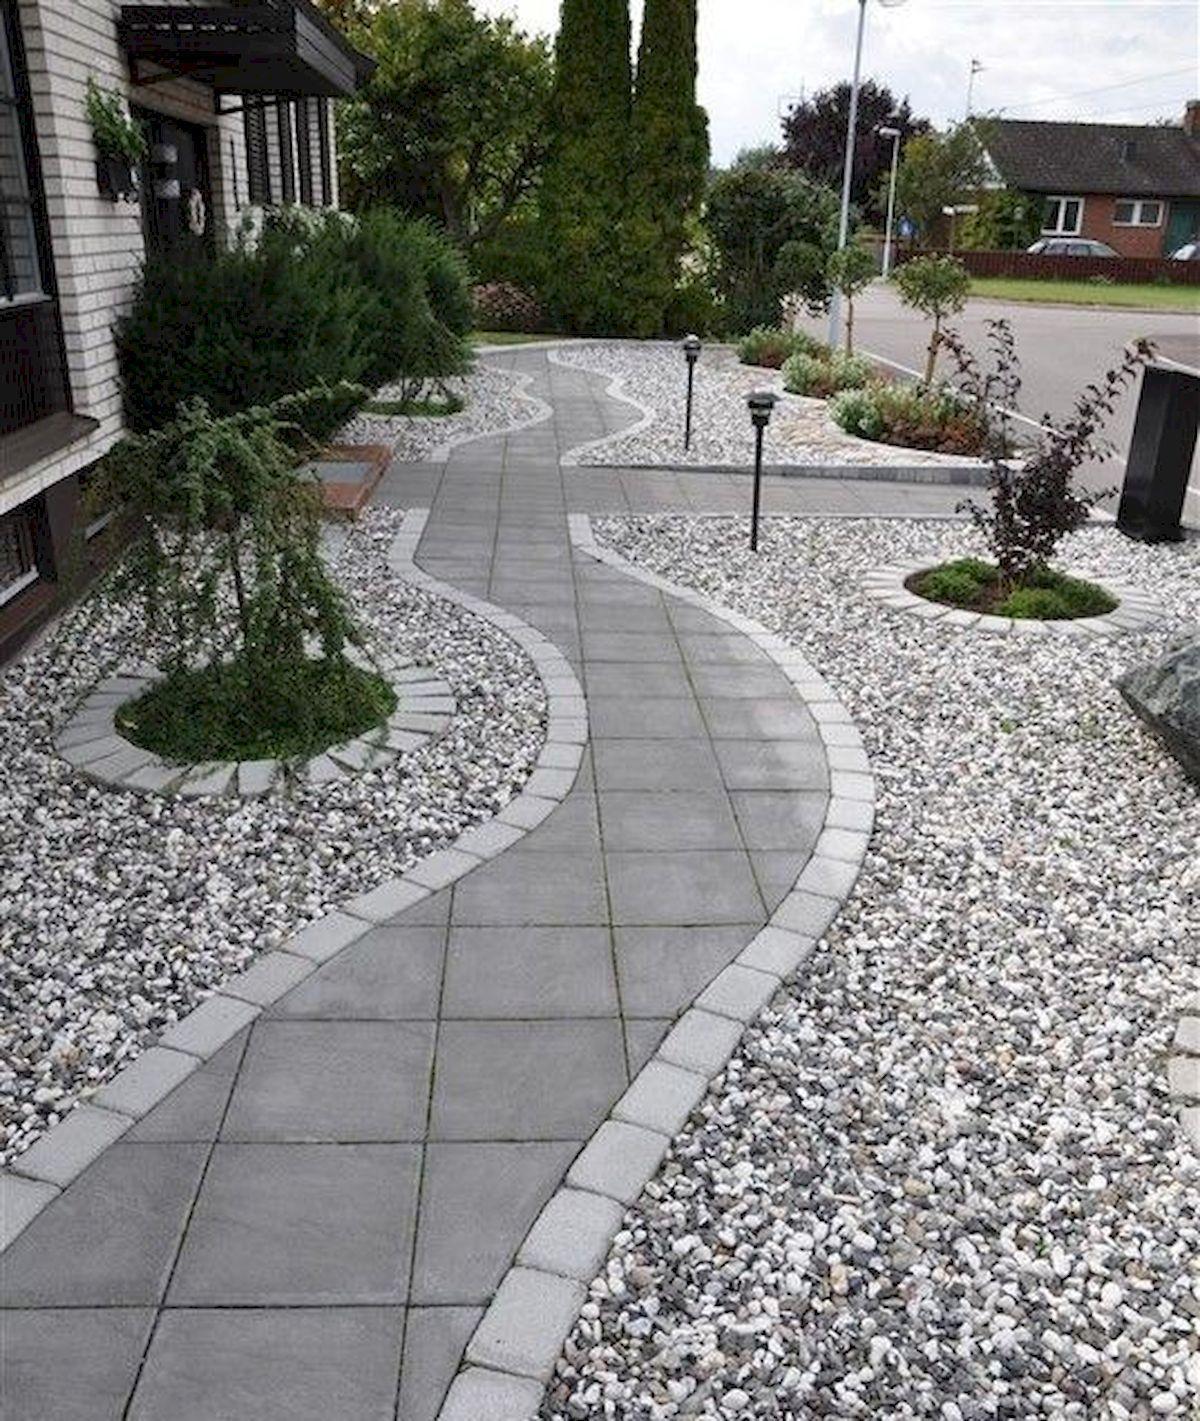 70 Magical Side Yard And Backyard Gravel Garden Design Ideas 6